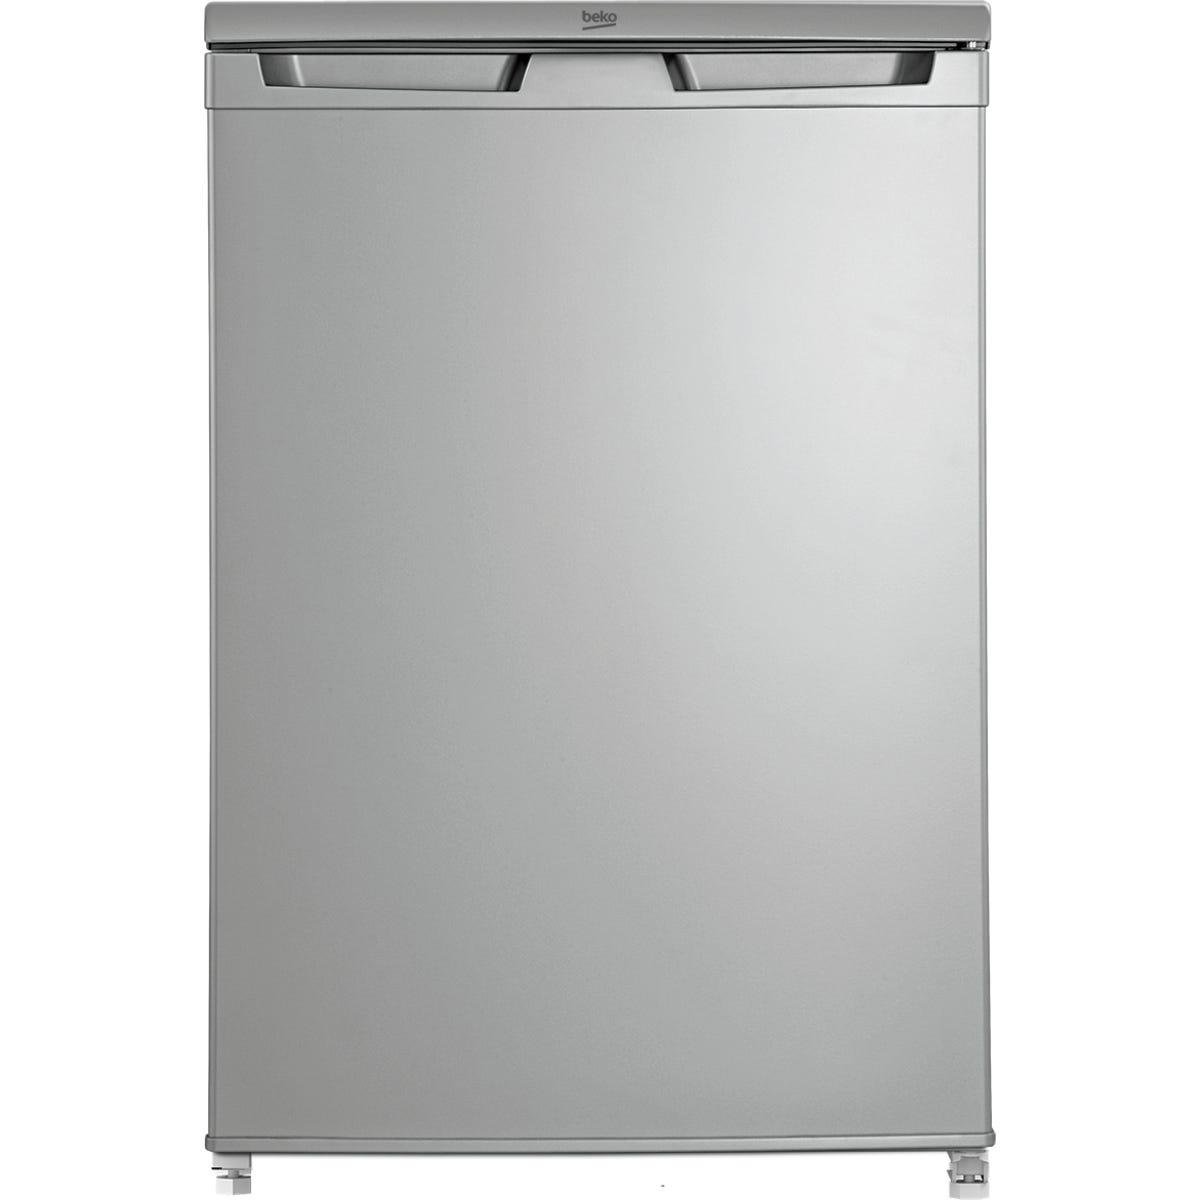 Beko UR4584S 101L Static Undercounter Fridge Freezer - Silver